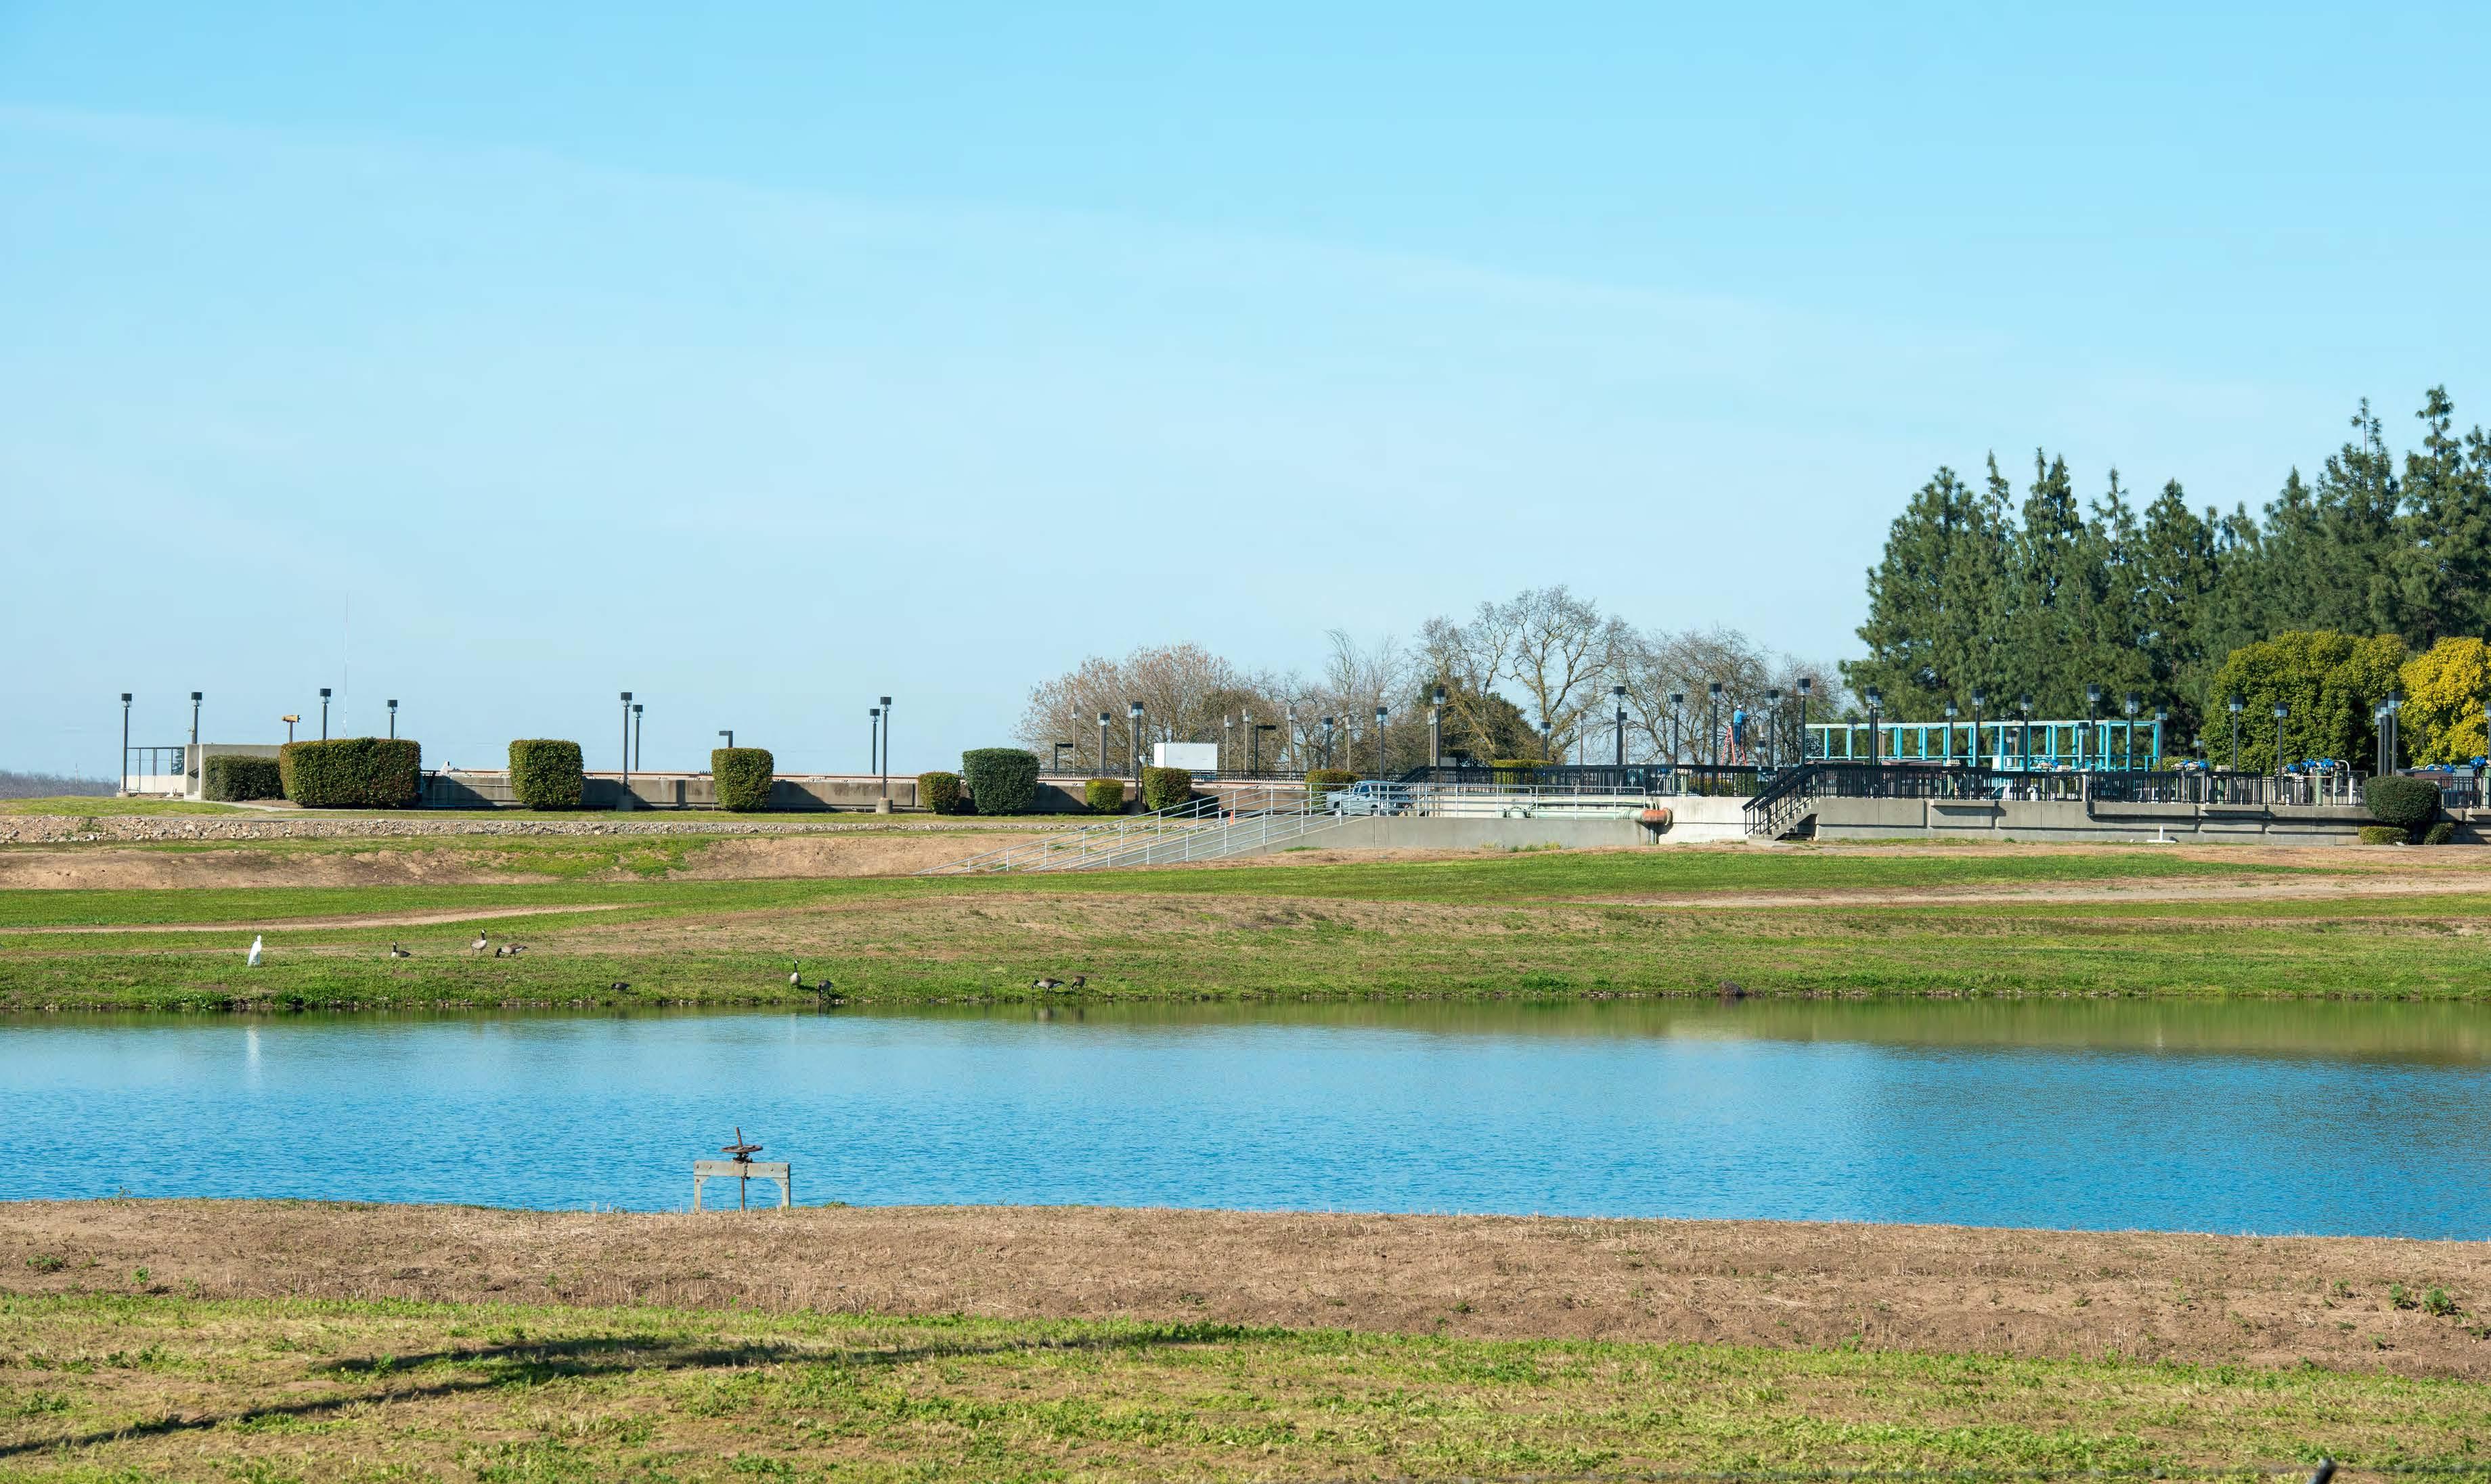 Overview w Pond